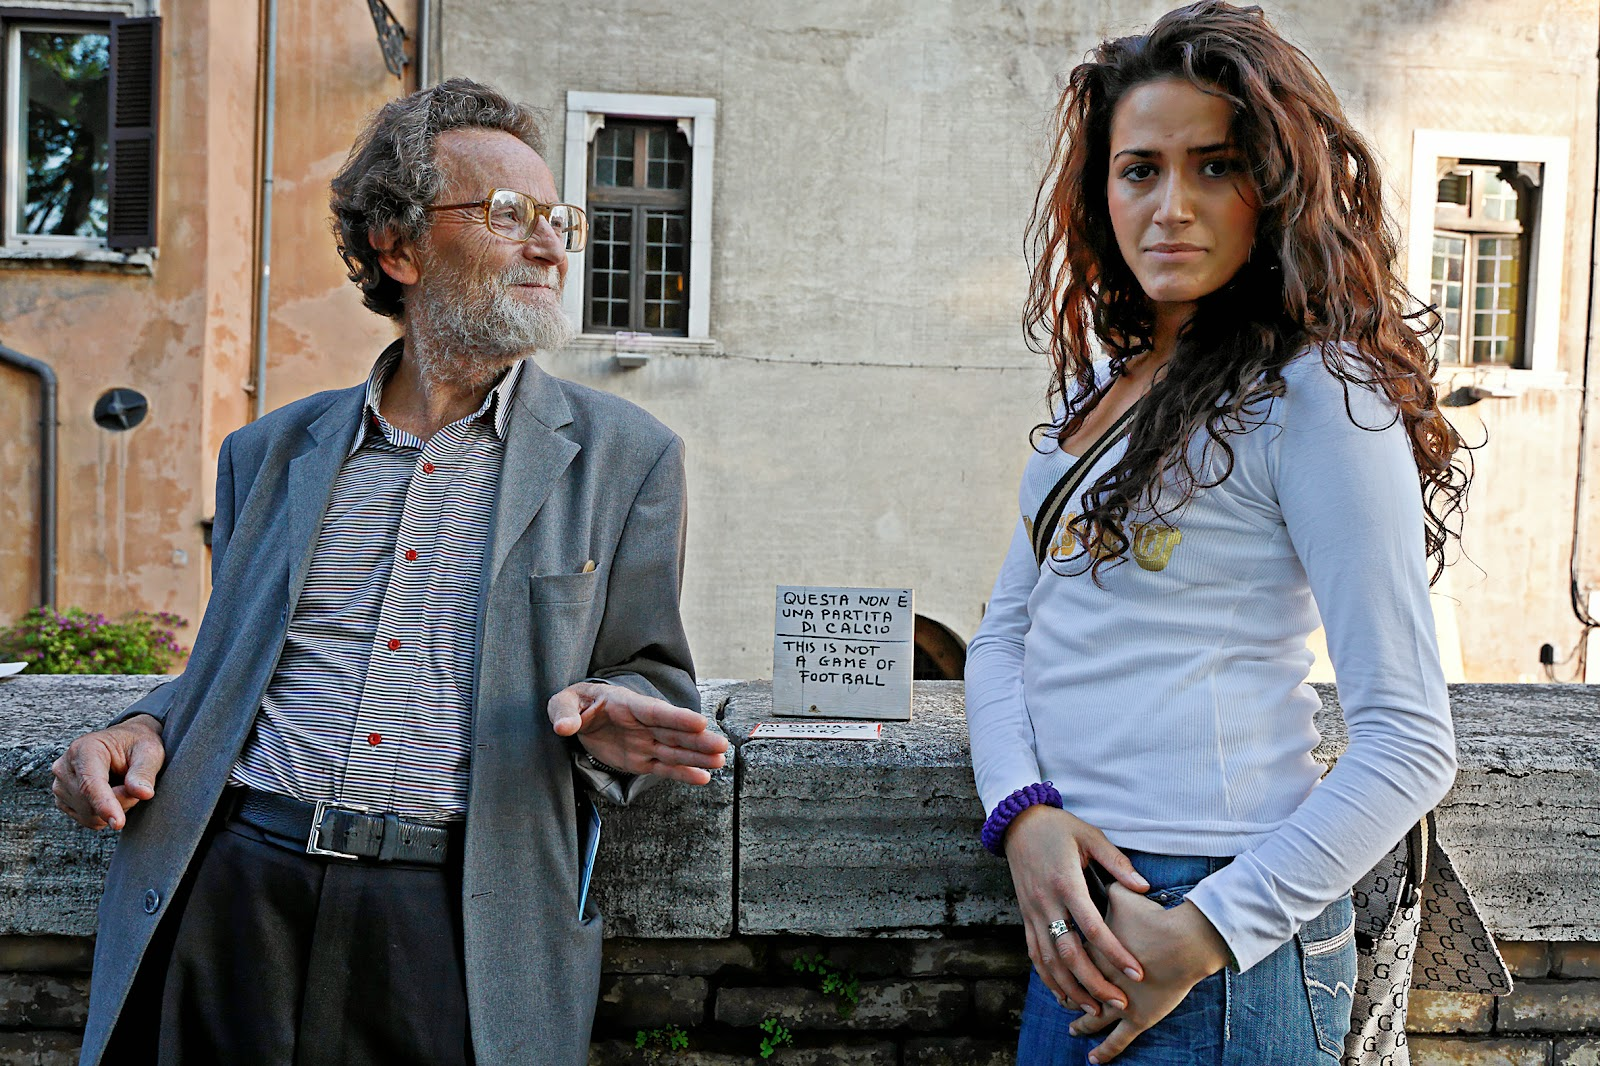 Pian dé Giullari: Fausto Delle Chiaie